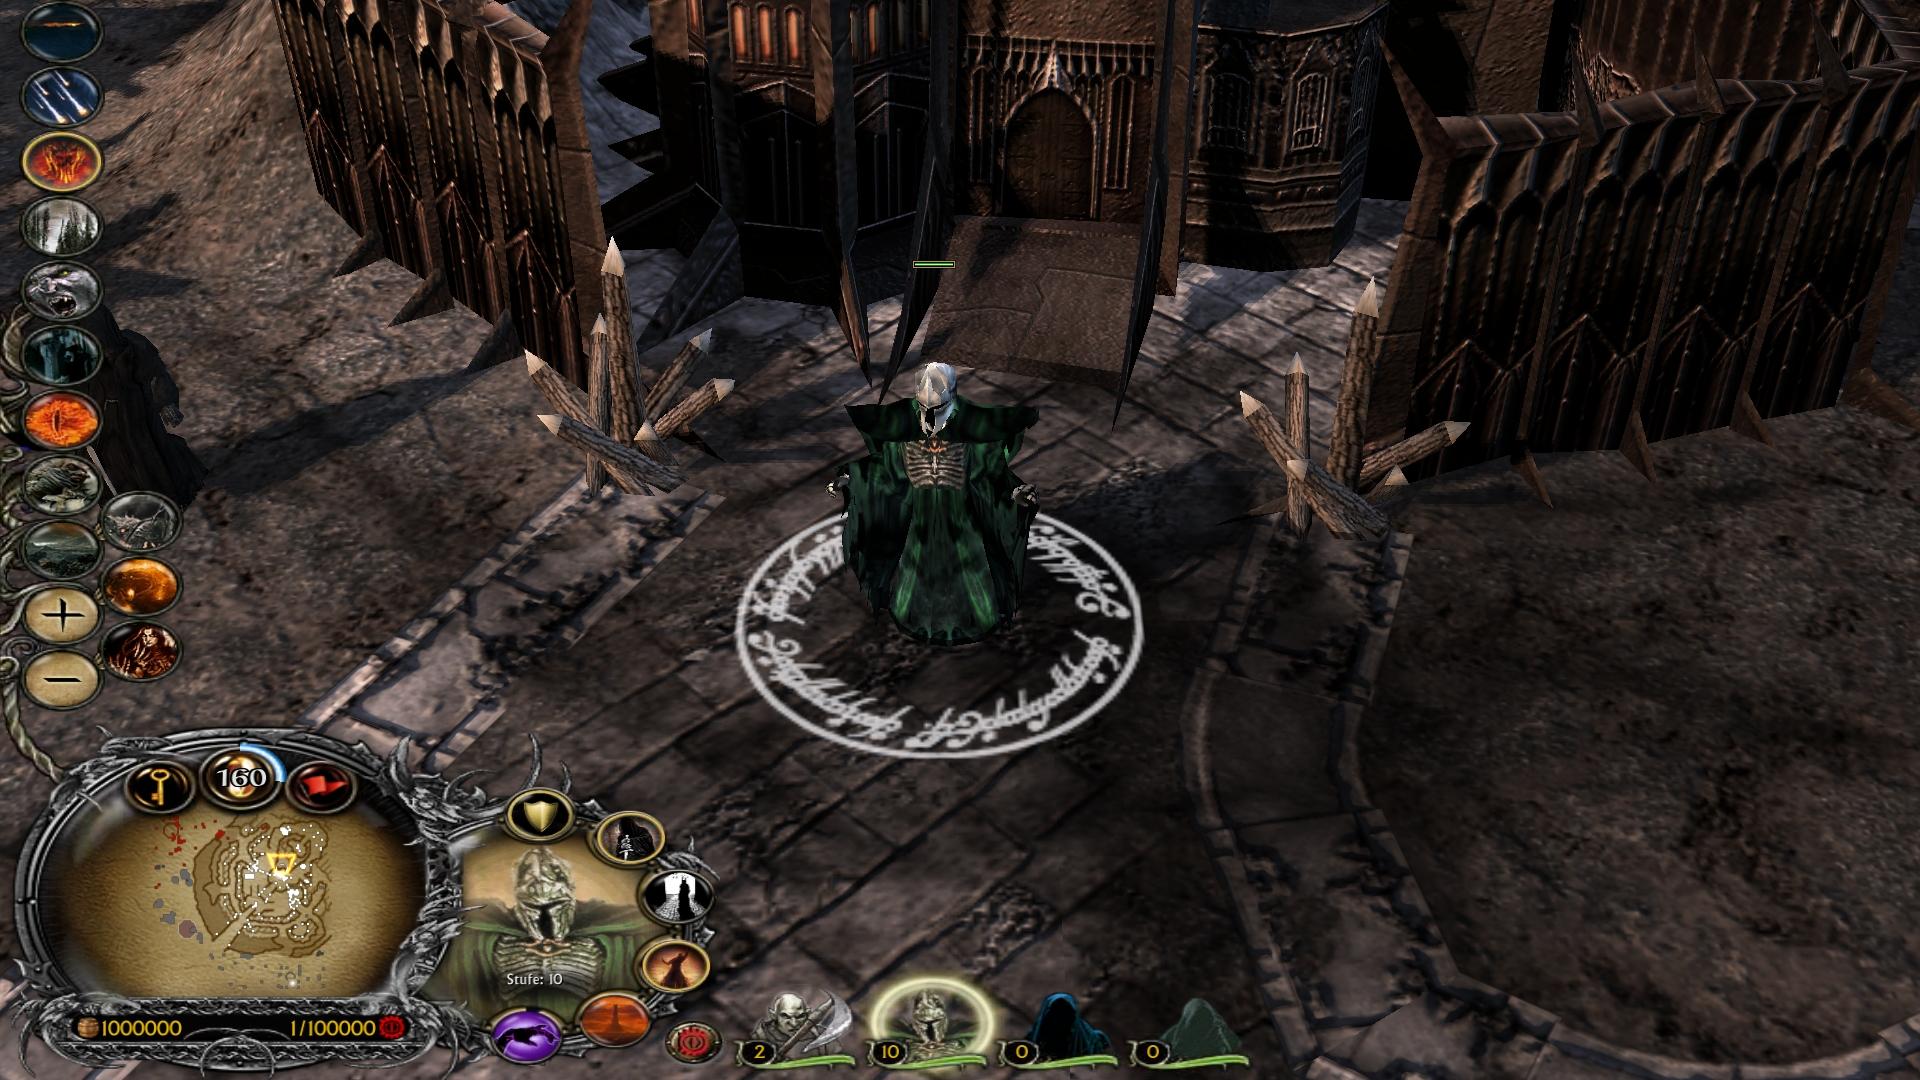 Sauron Edain Mod 3 8 1 Image Thelord Of Barad Ur Mod Db